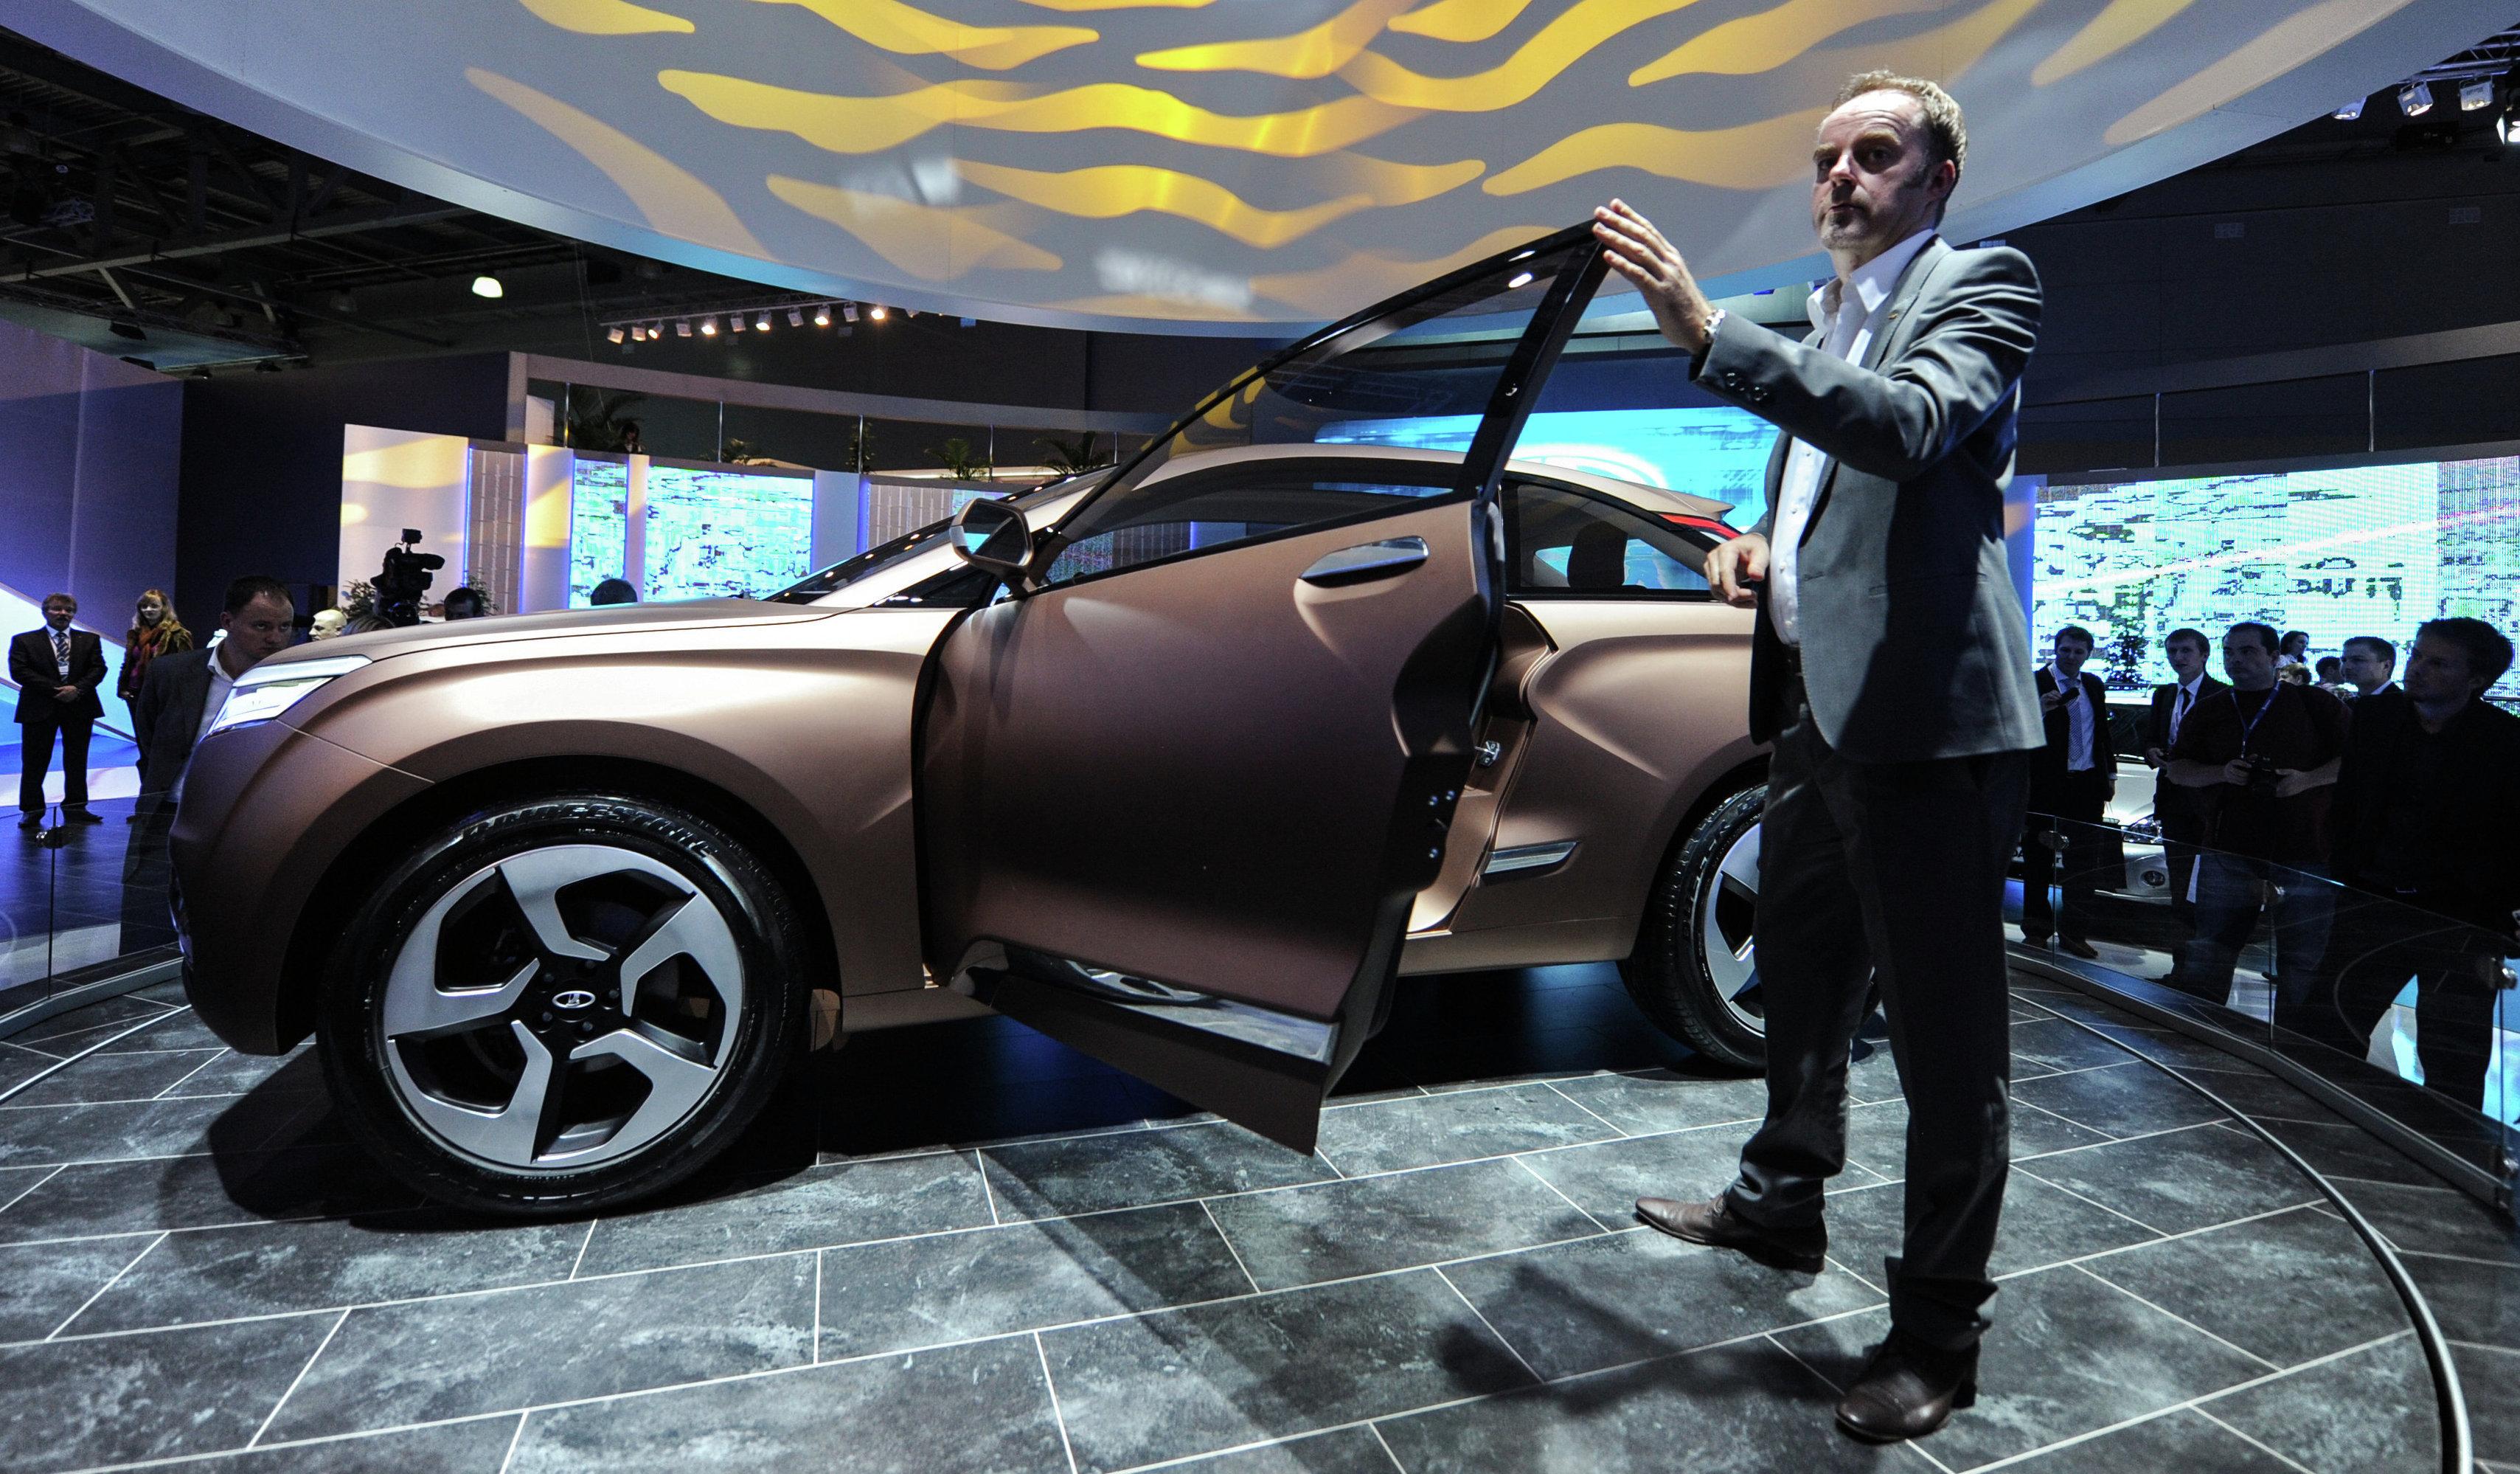 British automotive designer Steve Mattin with his creation, the XRay.